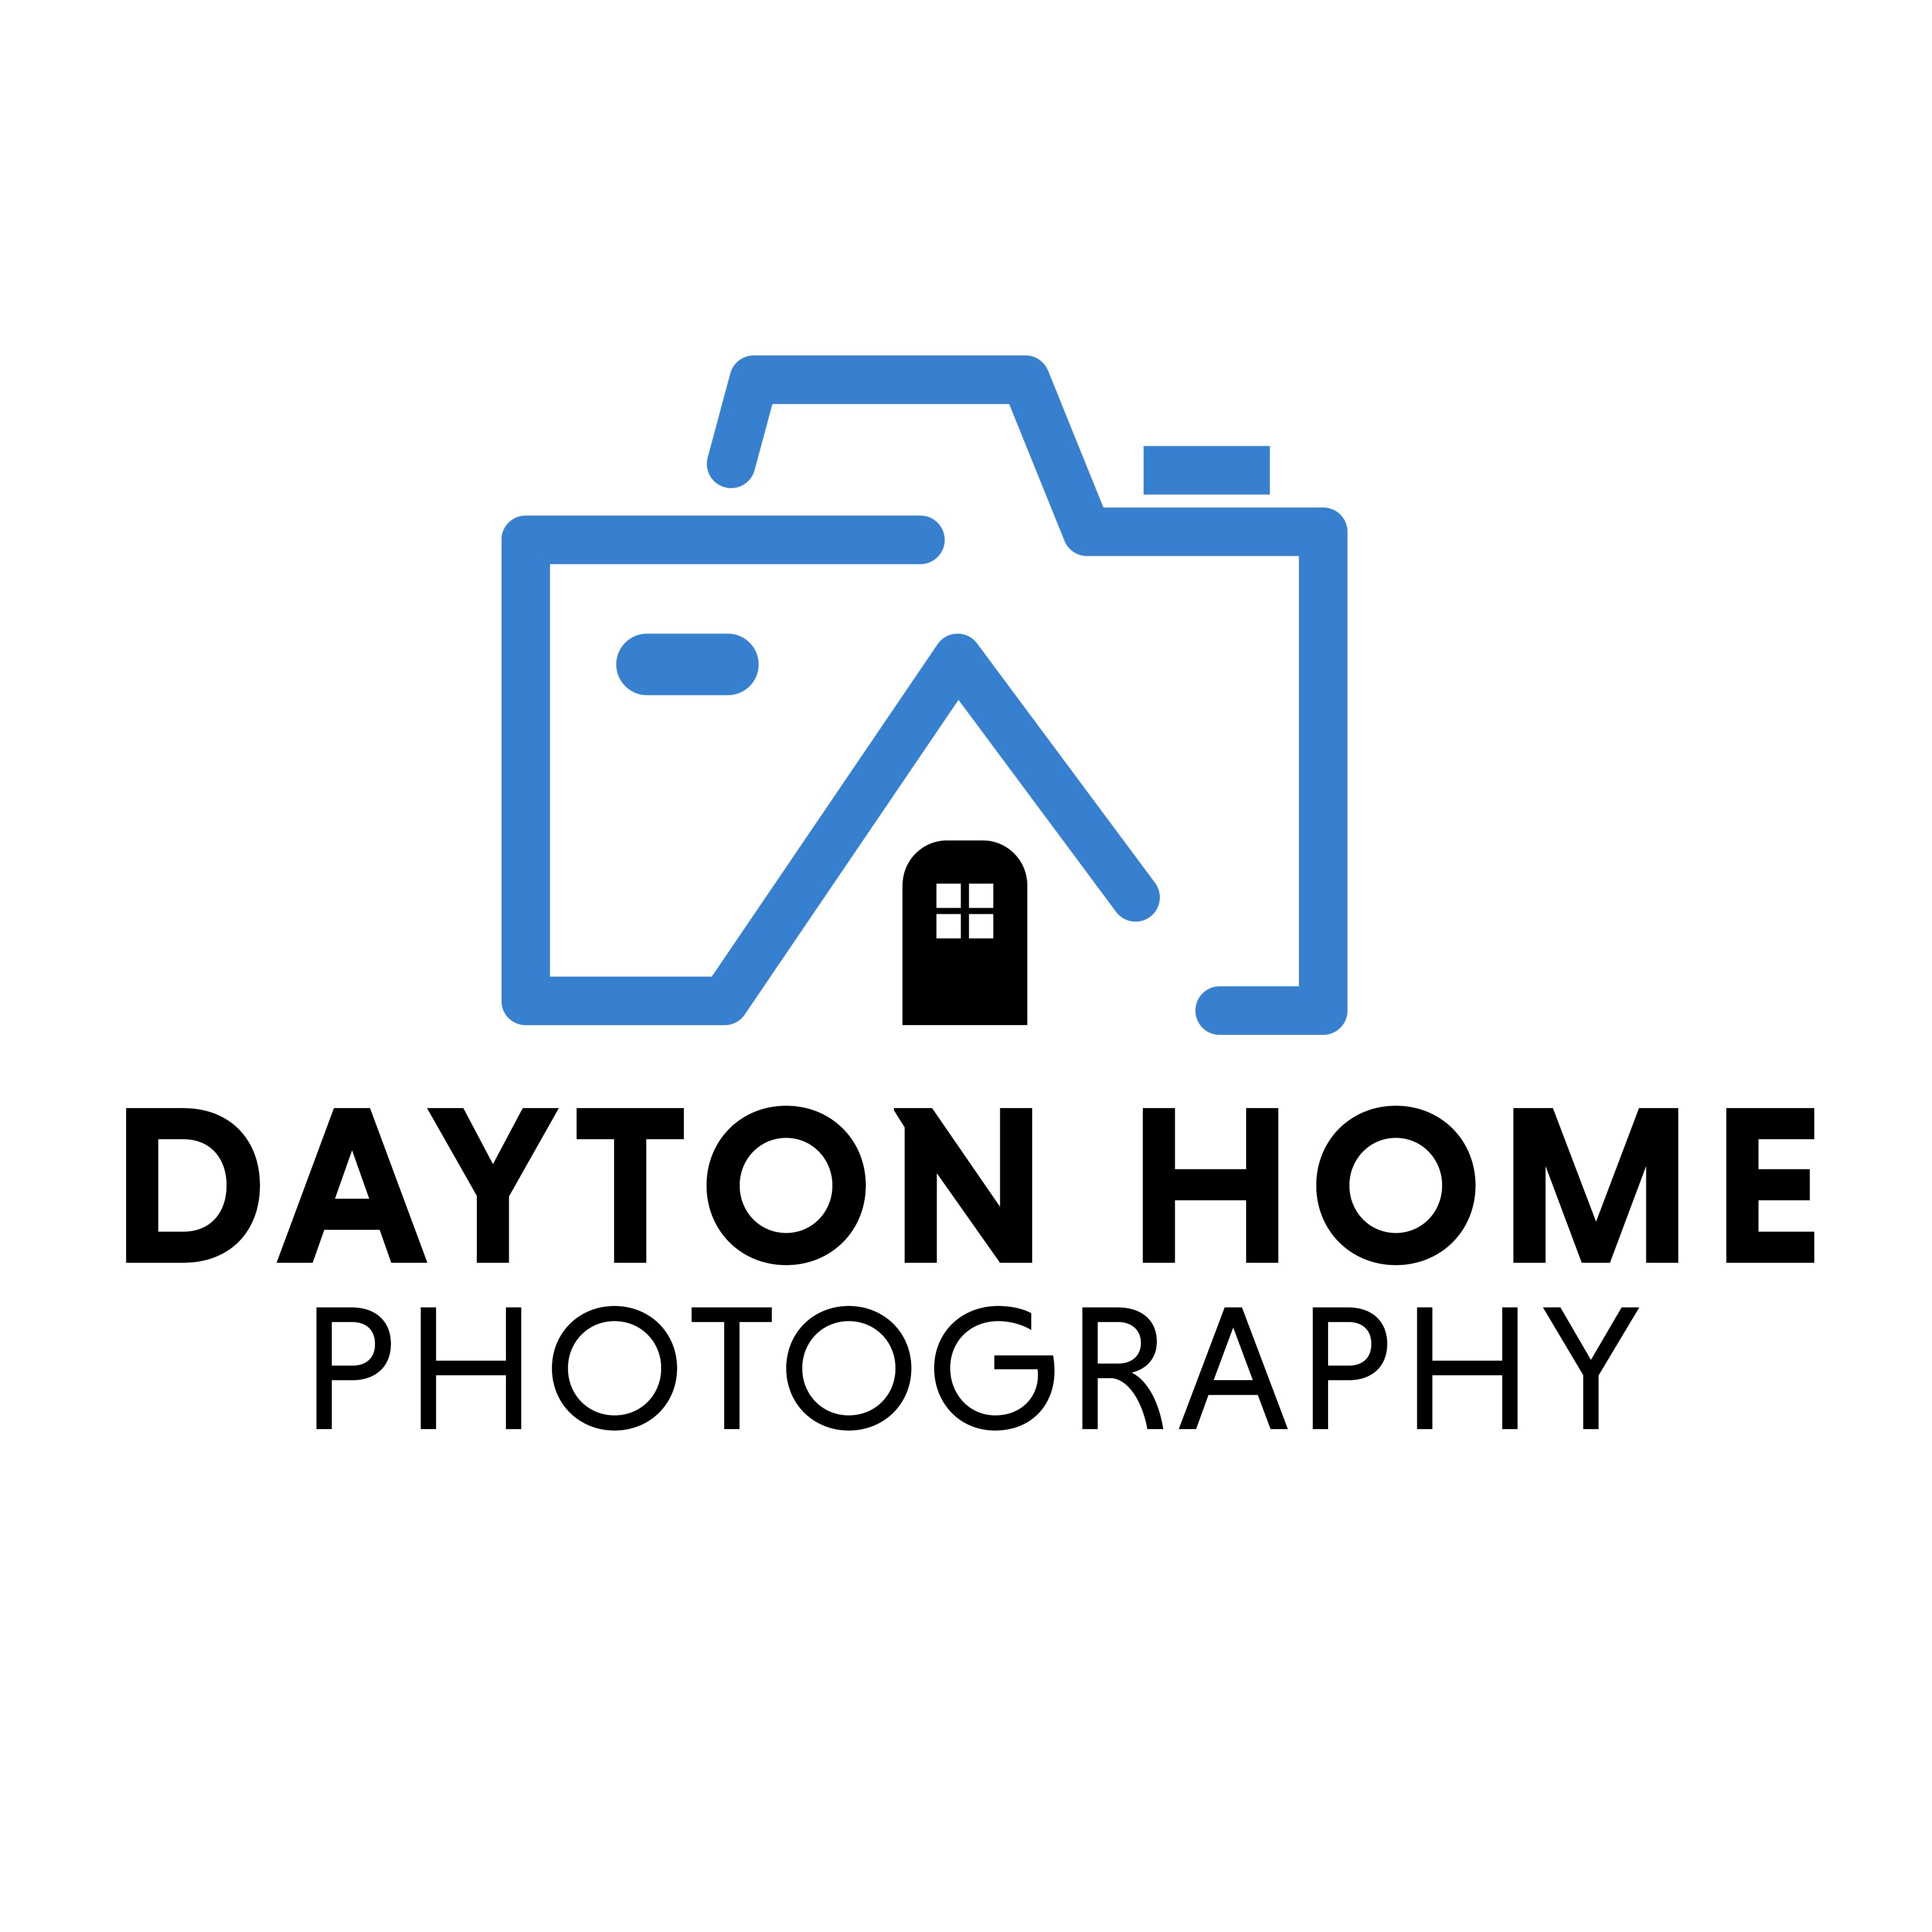 Dayton Home Photography floor plan in Dayton